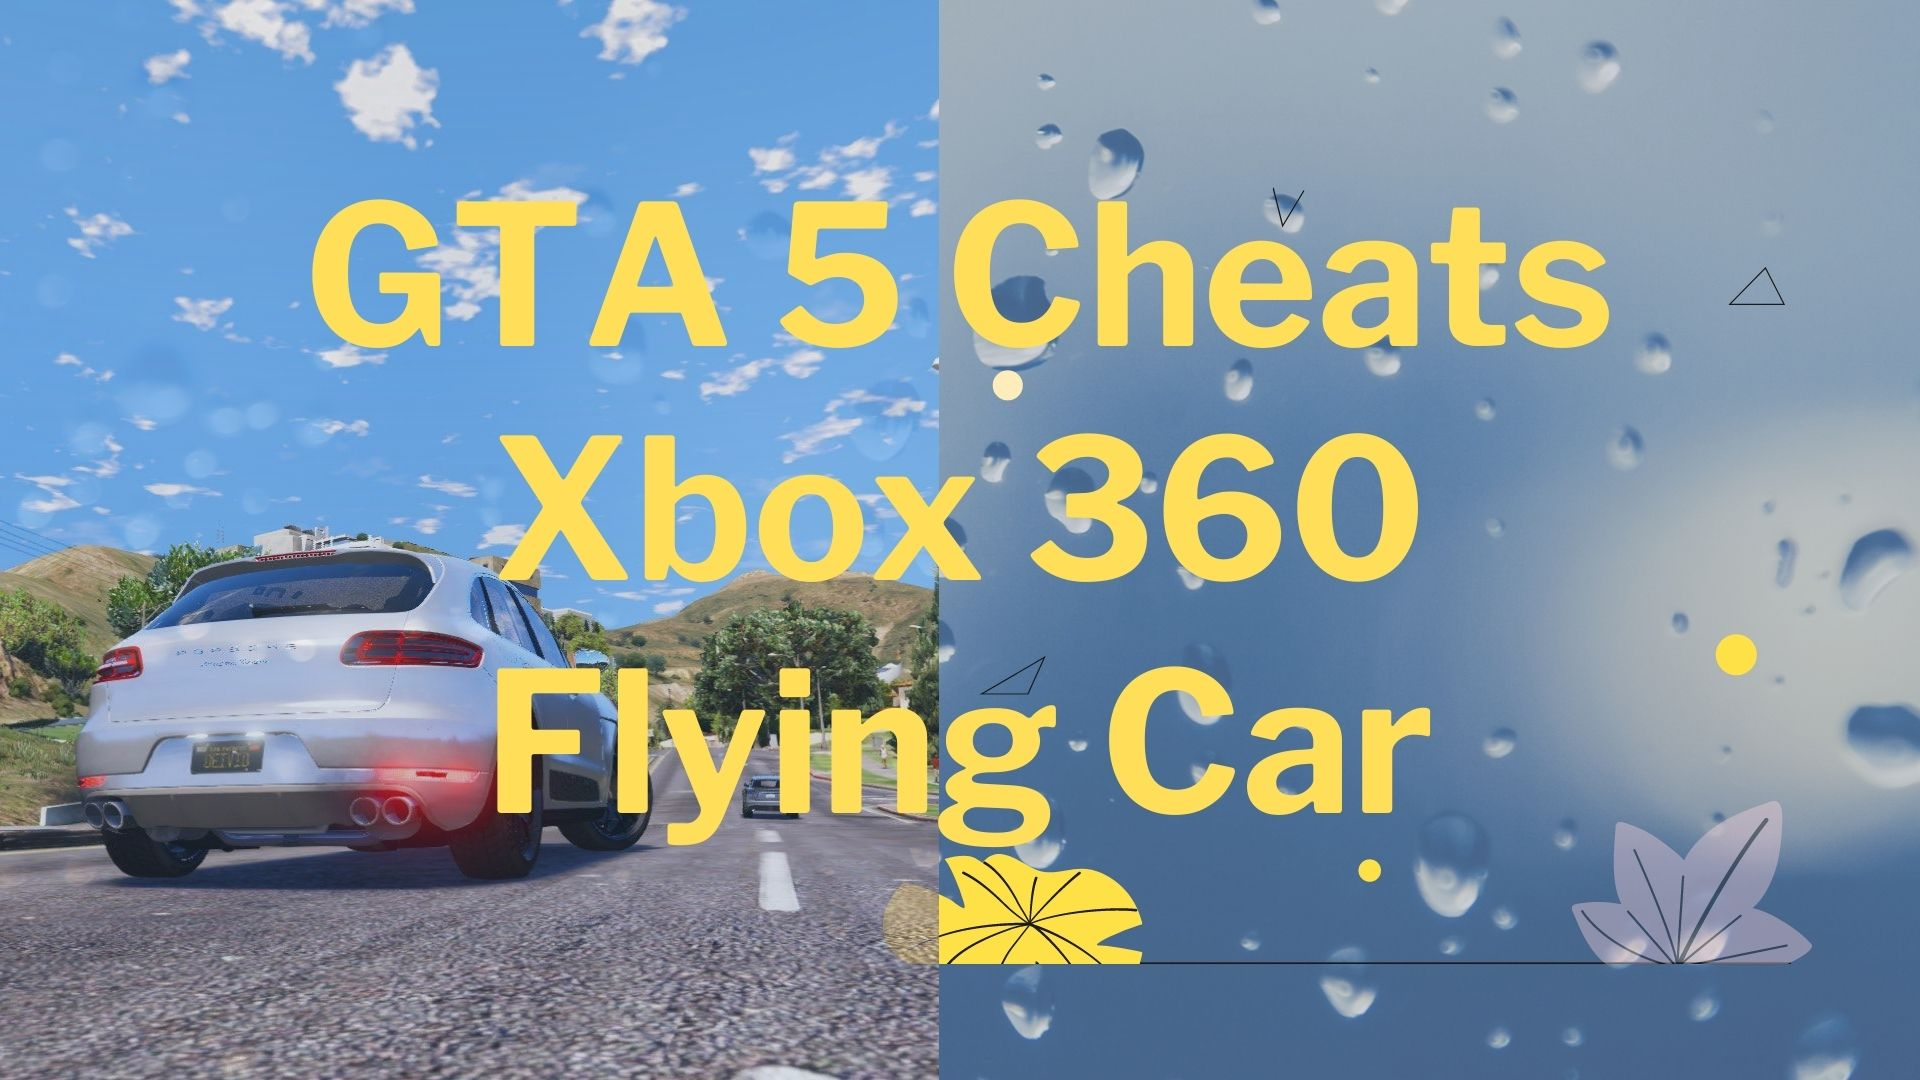 GTA 5 Cheats Xbox 360 Flying Car